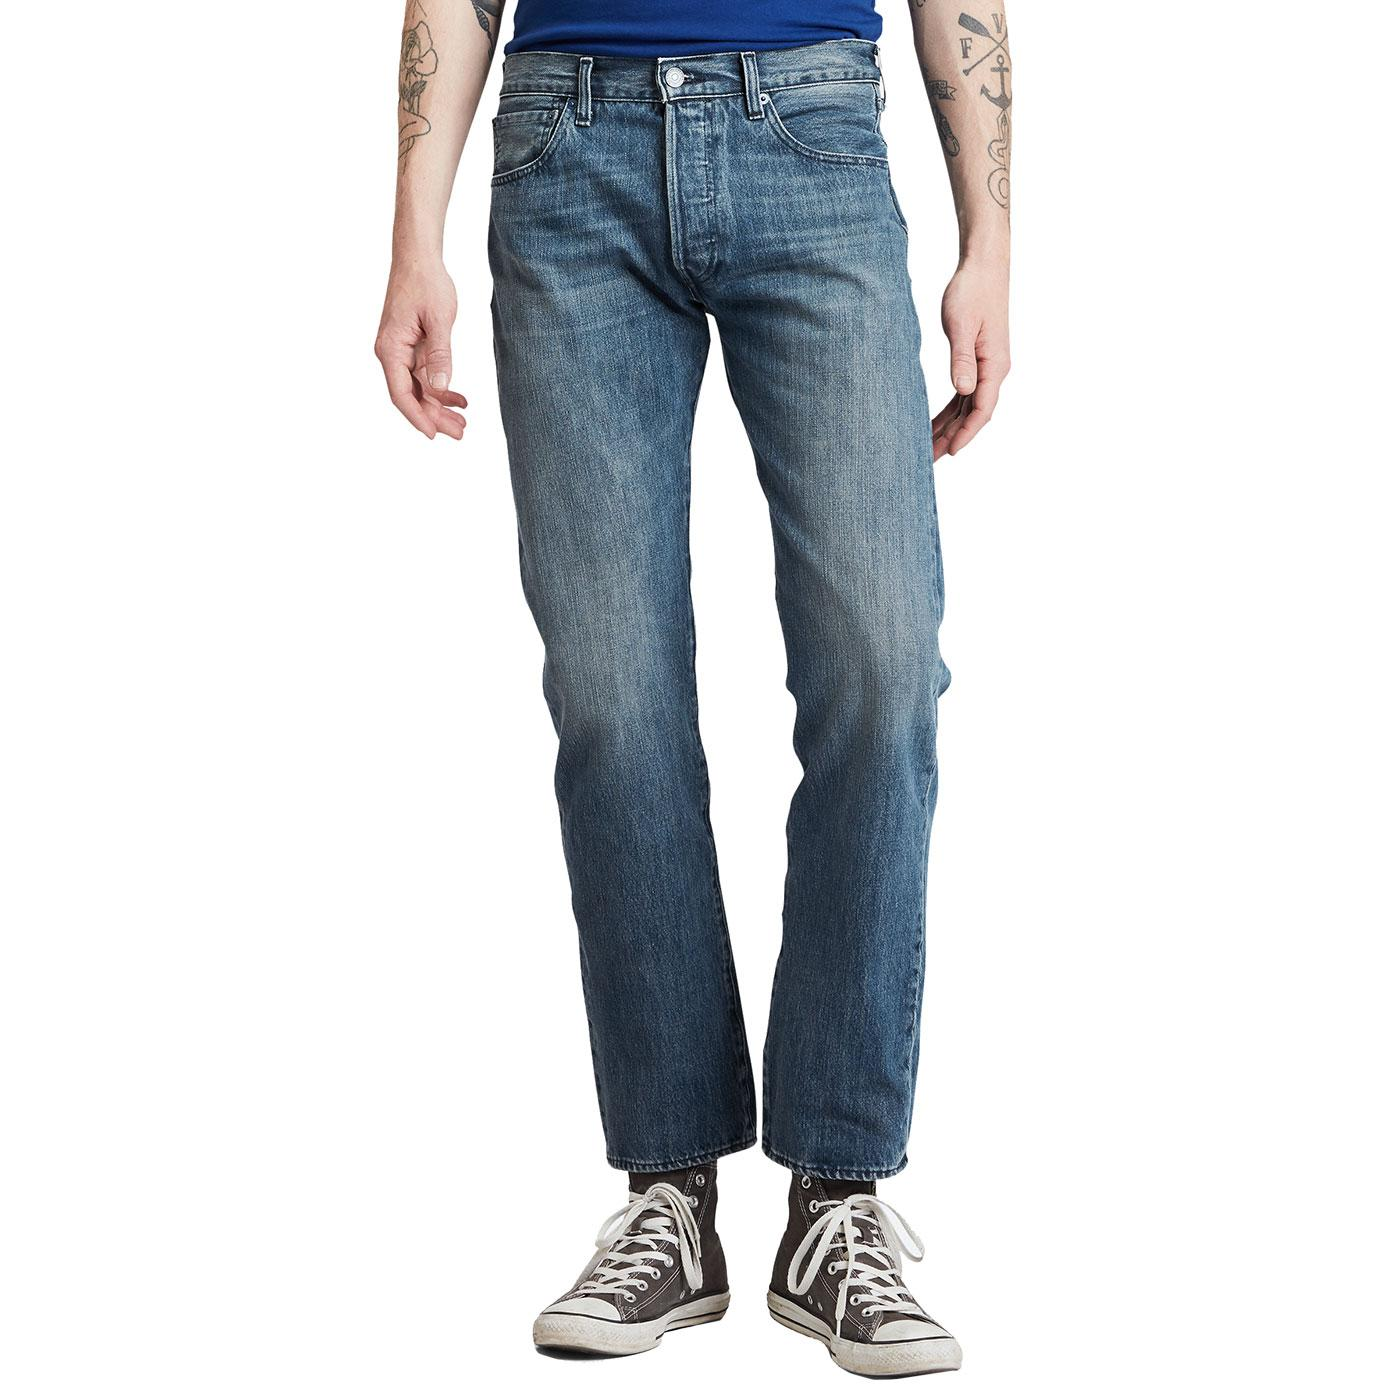 LEVI'S 501 Original Straight Denim Jeans TB